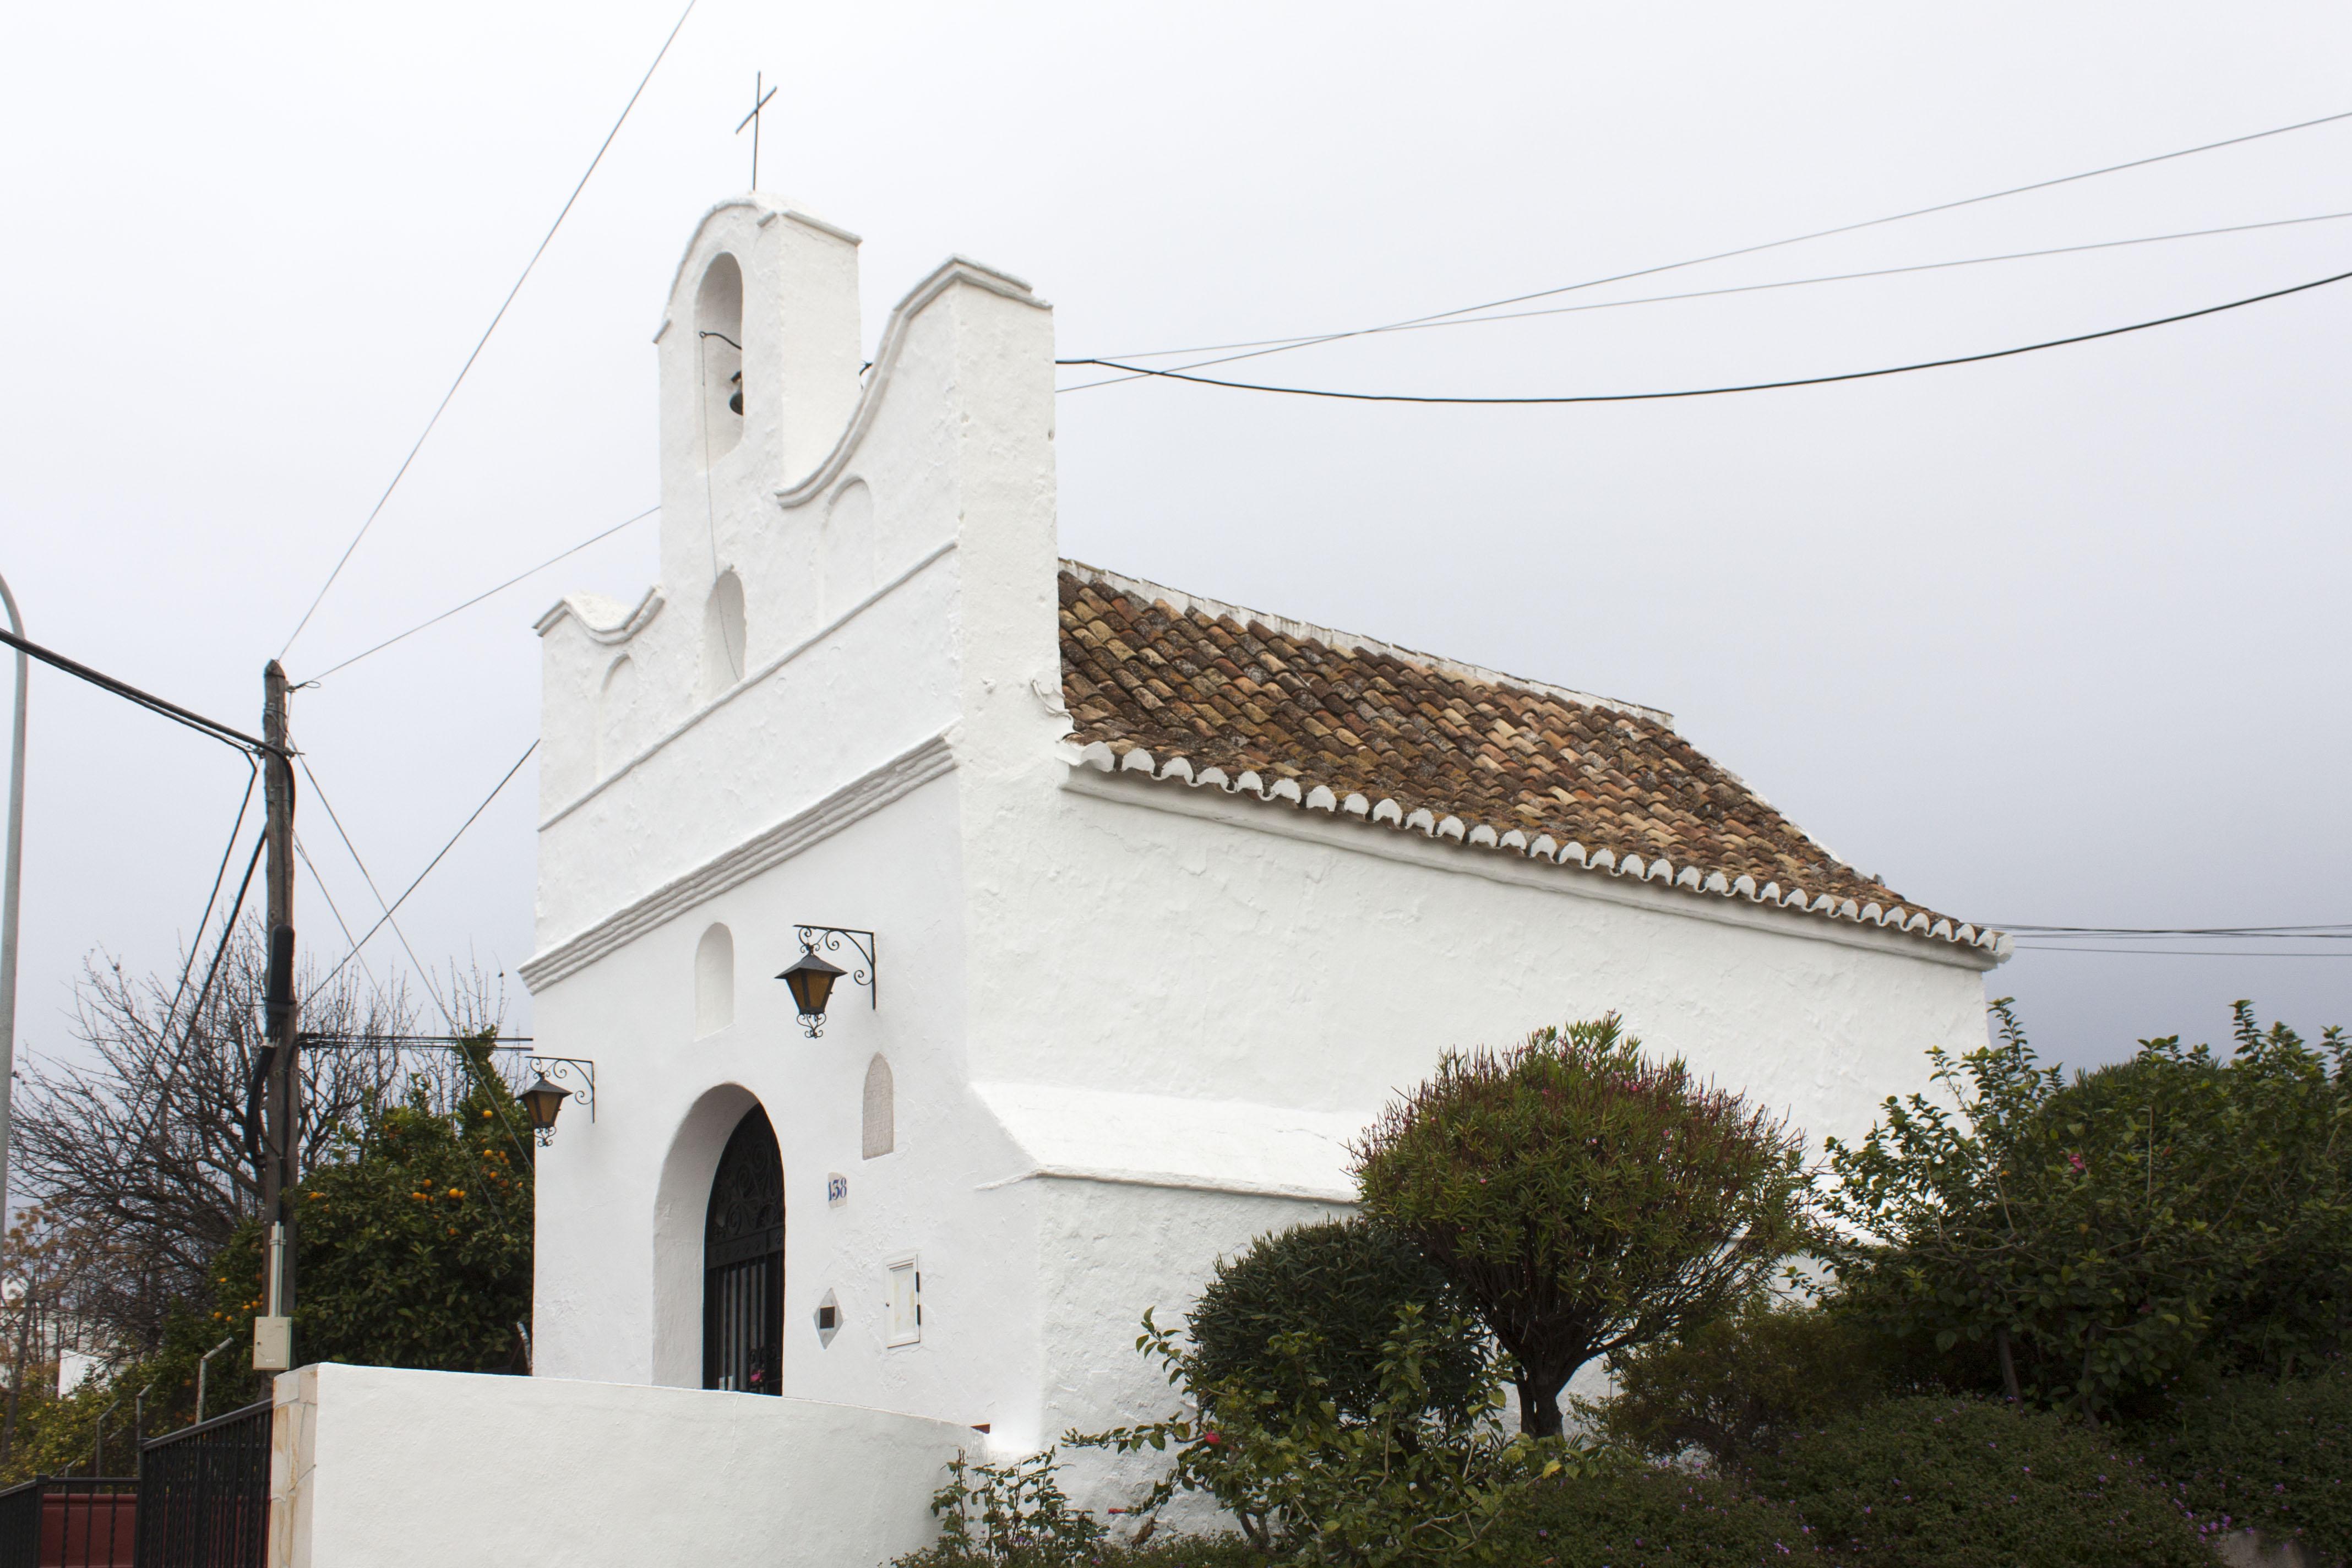 ermita-del-santisimo-cristo-de-la-agonia.-alhaurin-el-grande-(2)_o